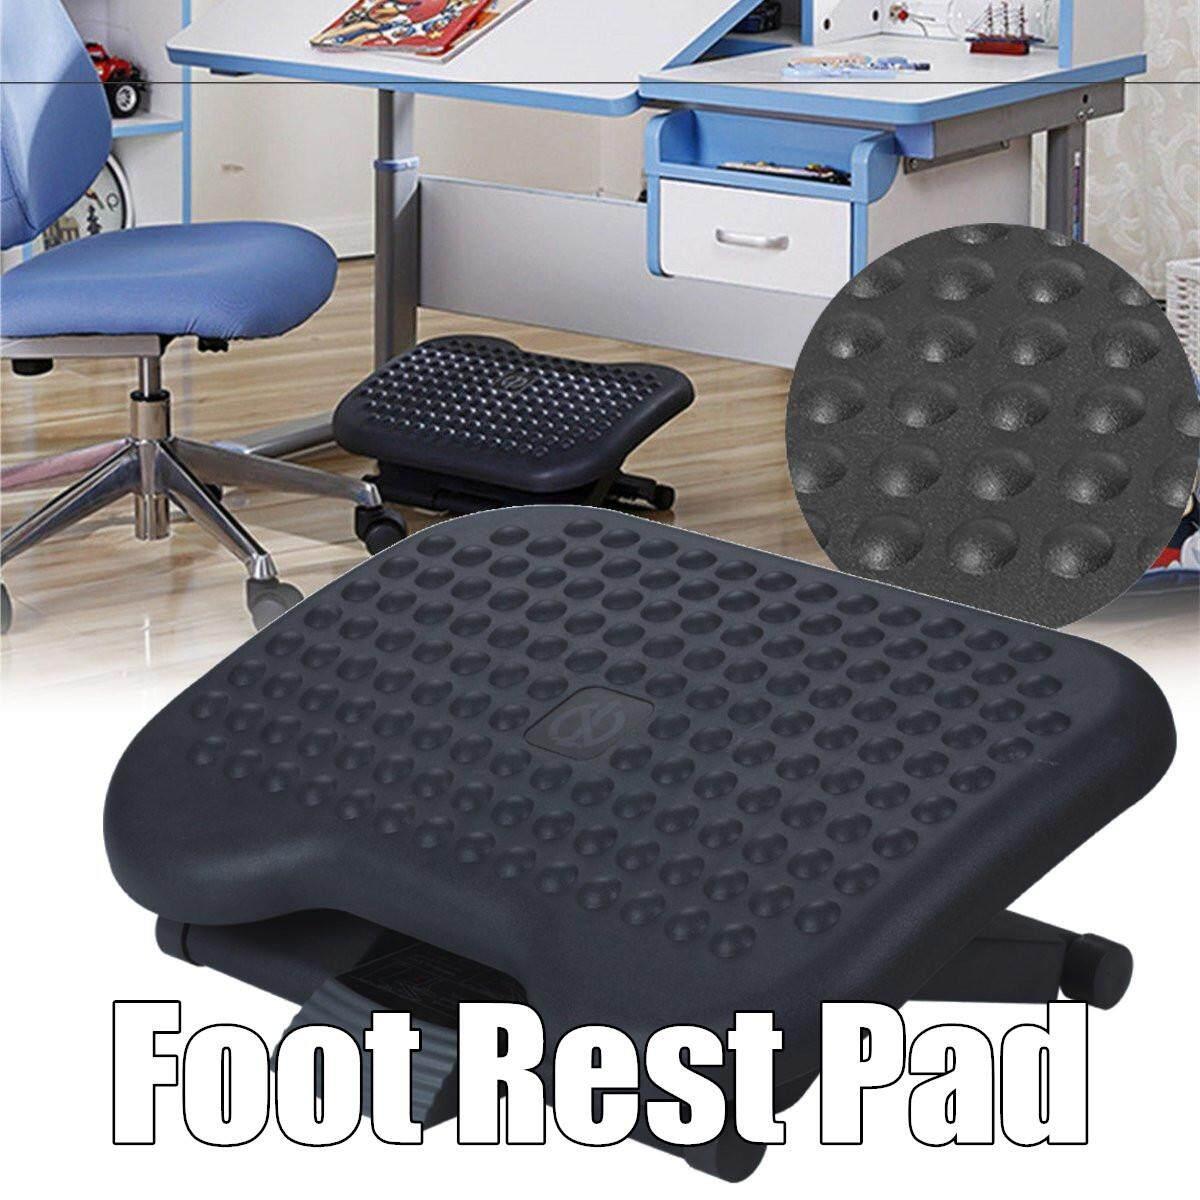 Angle Adjustable Premium Foot Rest Office Computer Desk Footrest Comfort